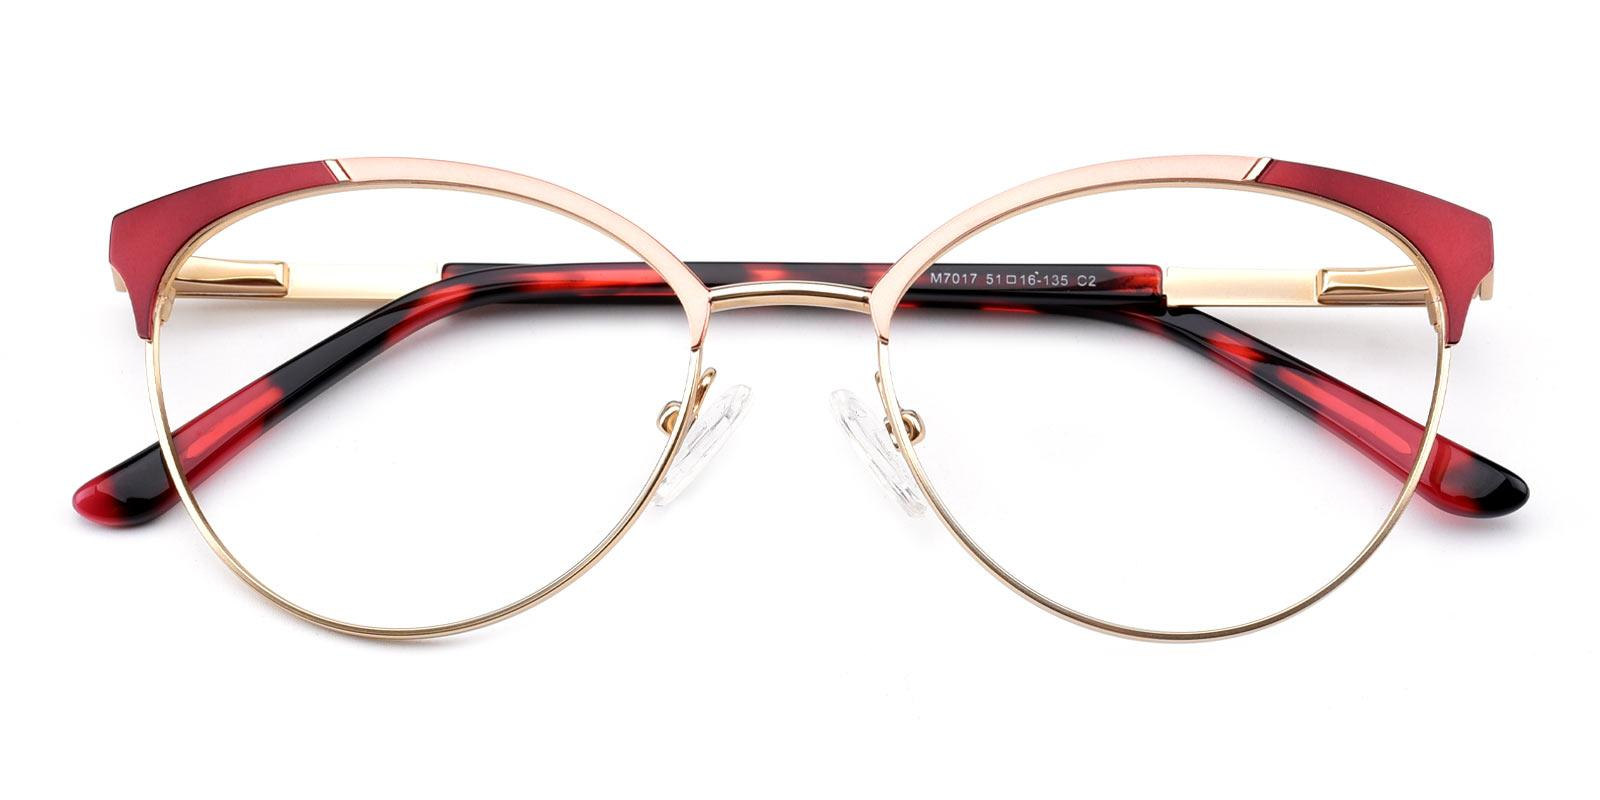 Hobbit-Red-Cat-Metal-Eyeglasses-detail